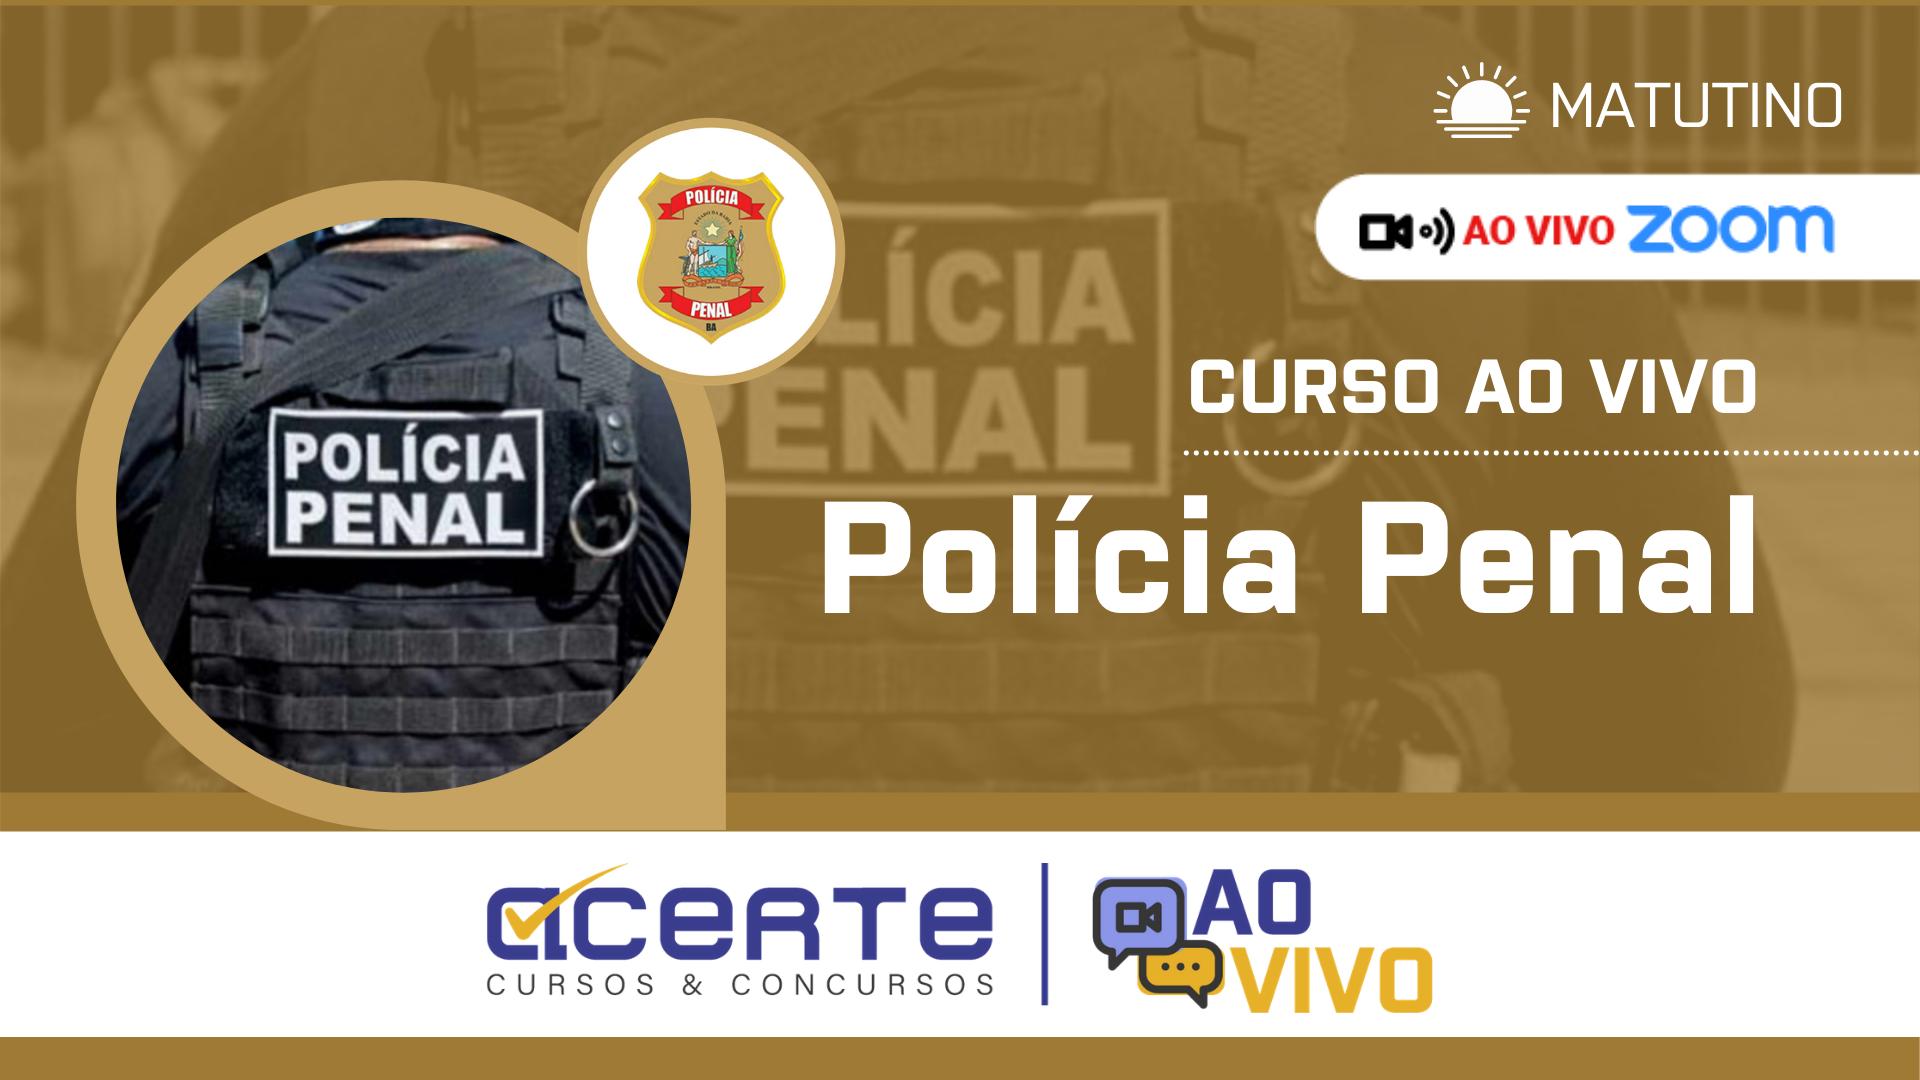 Polícia Penal  AO VIVO - Matutino